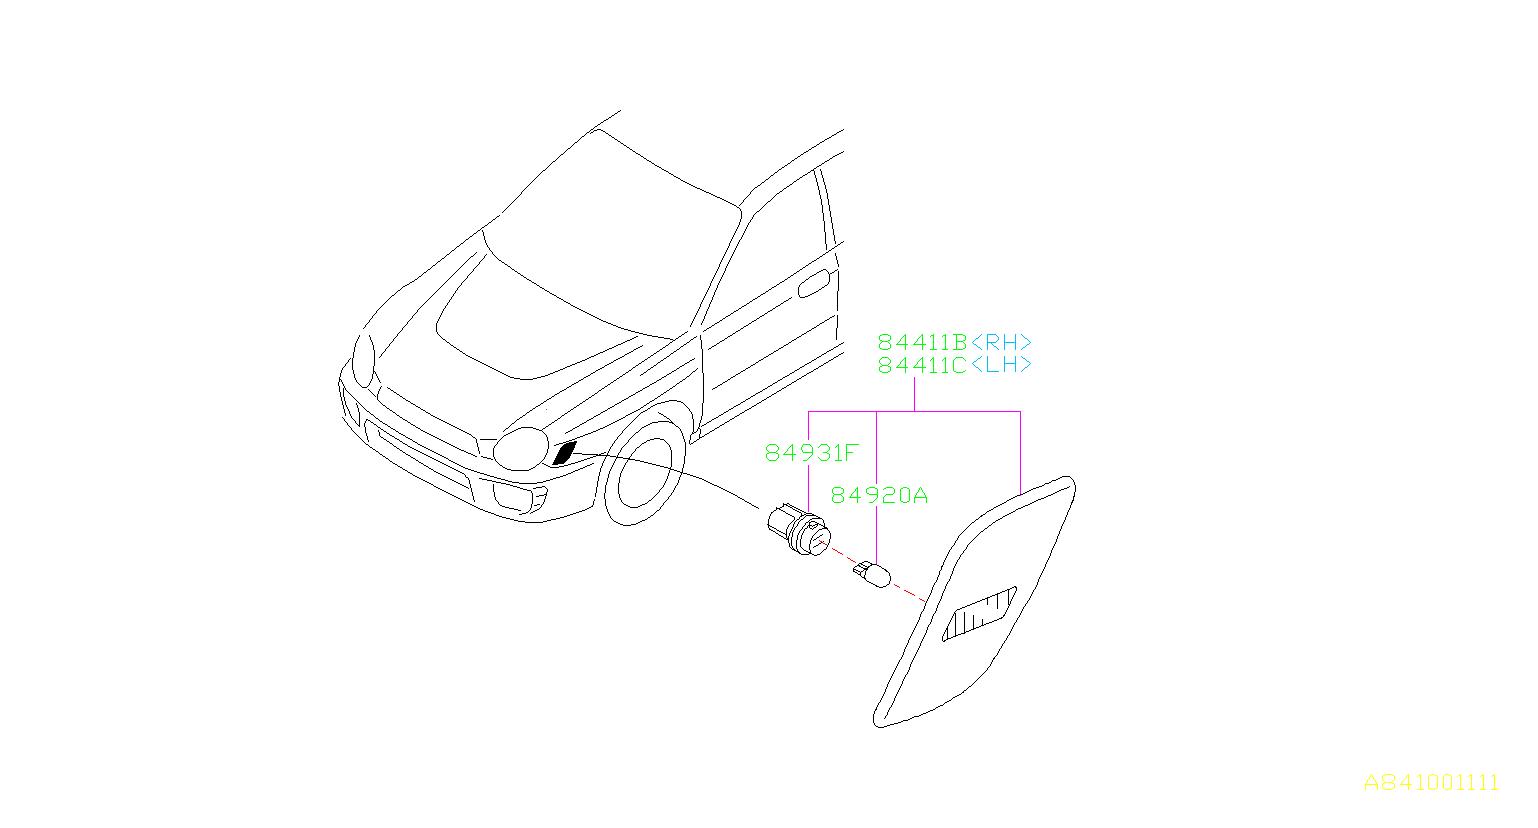 Subaru Impreza Socket Complete Side Turn Lamp Front